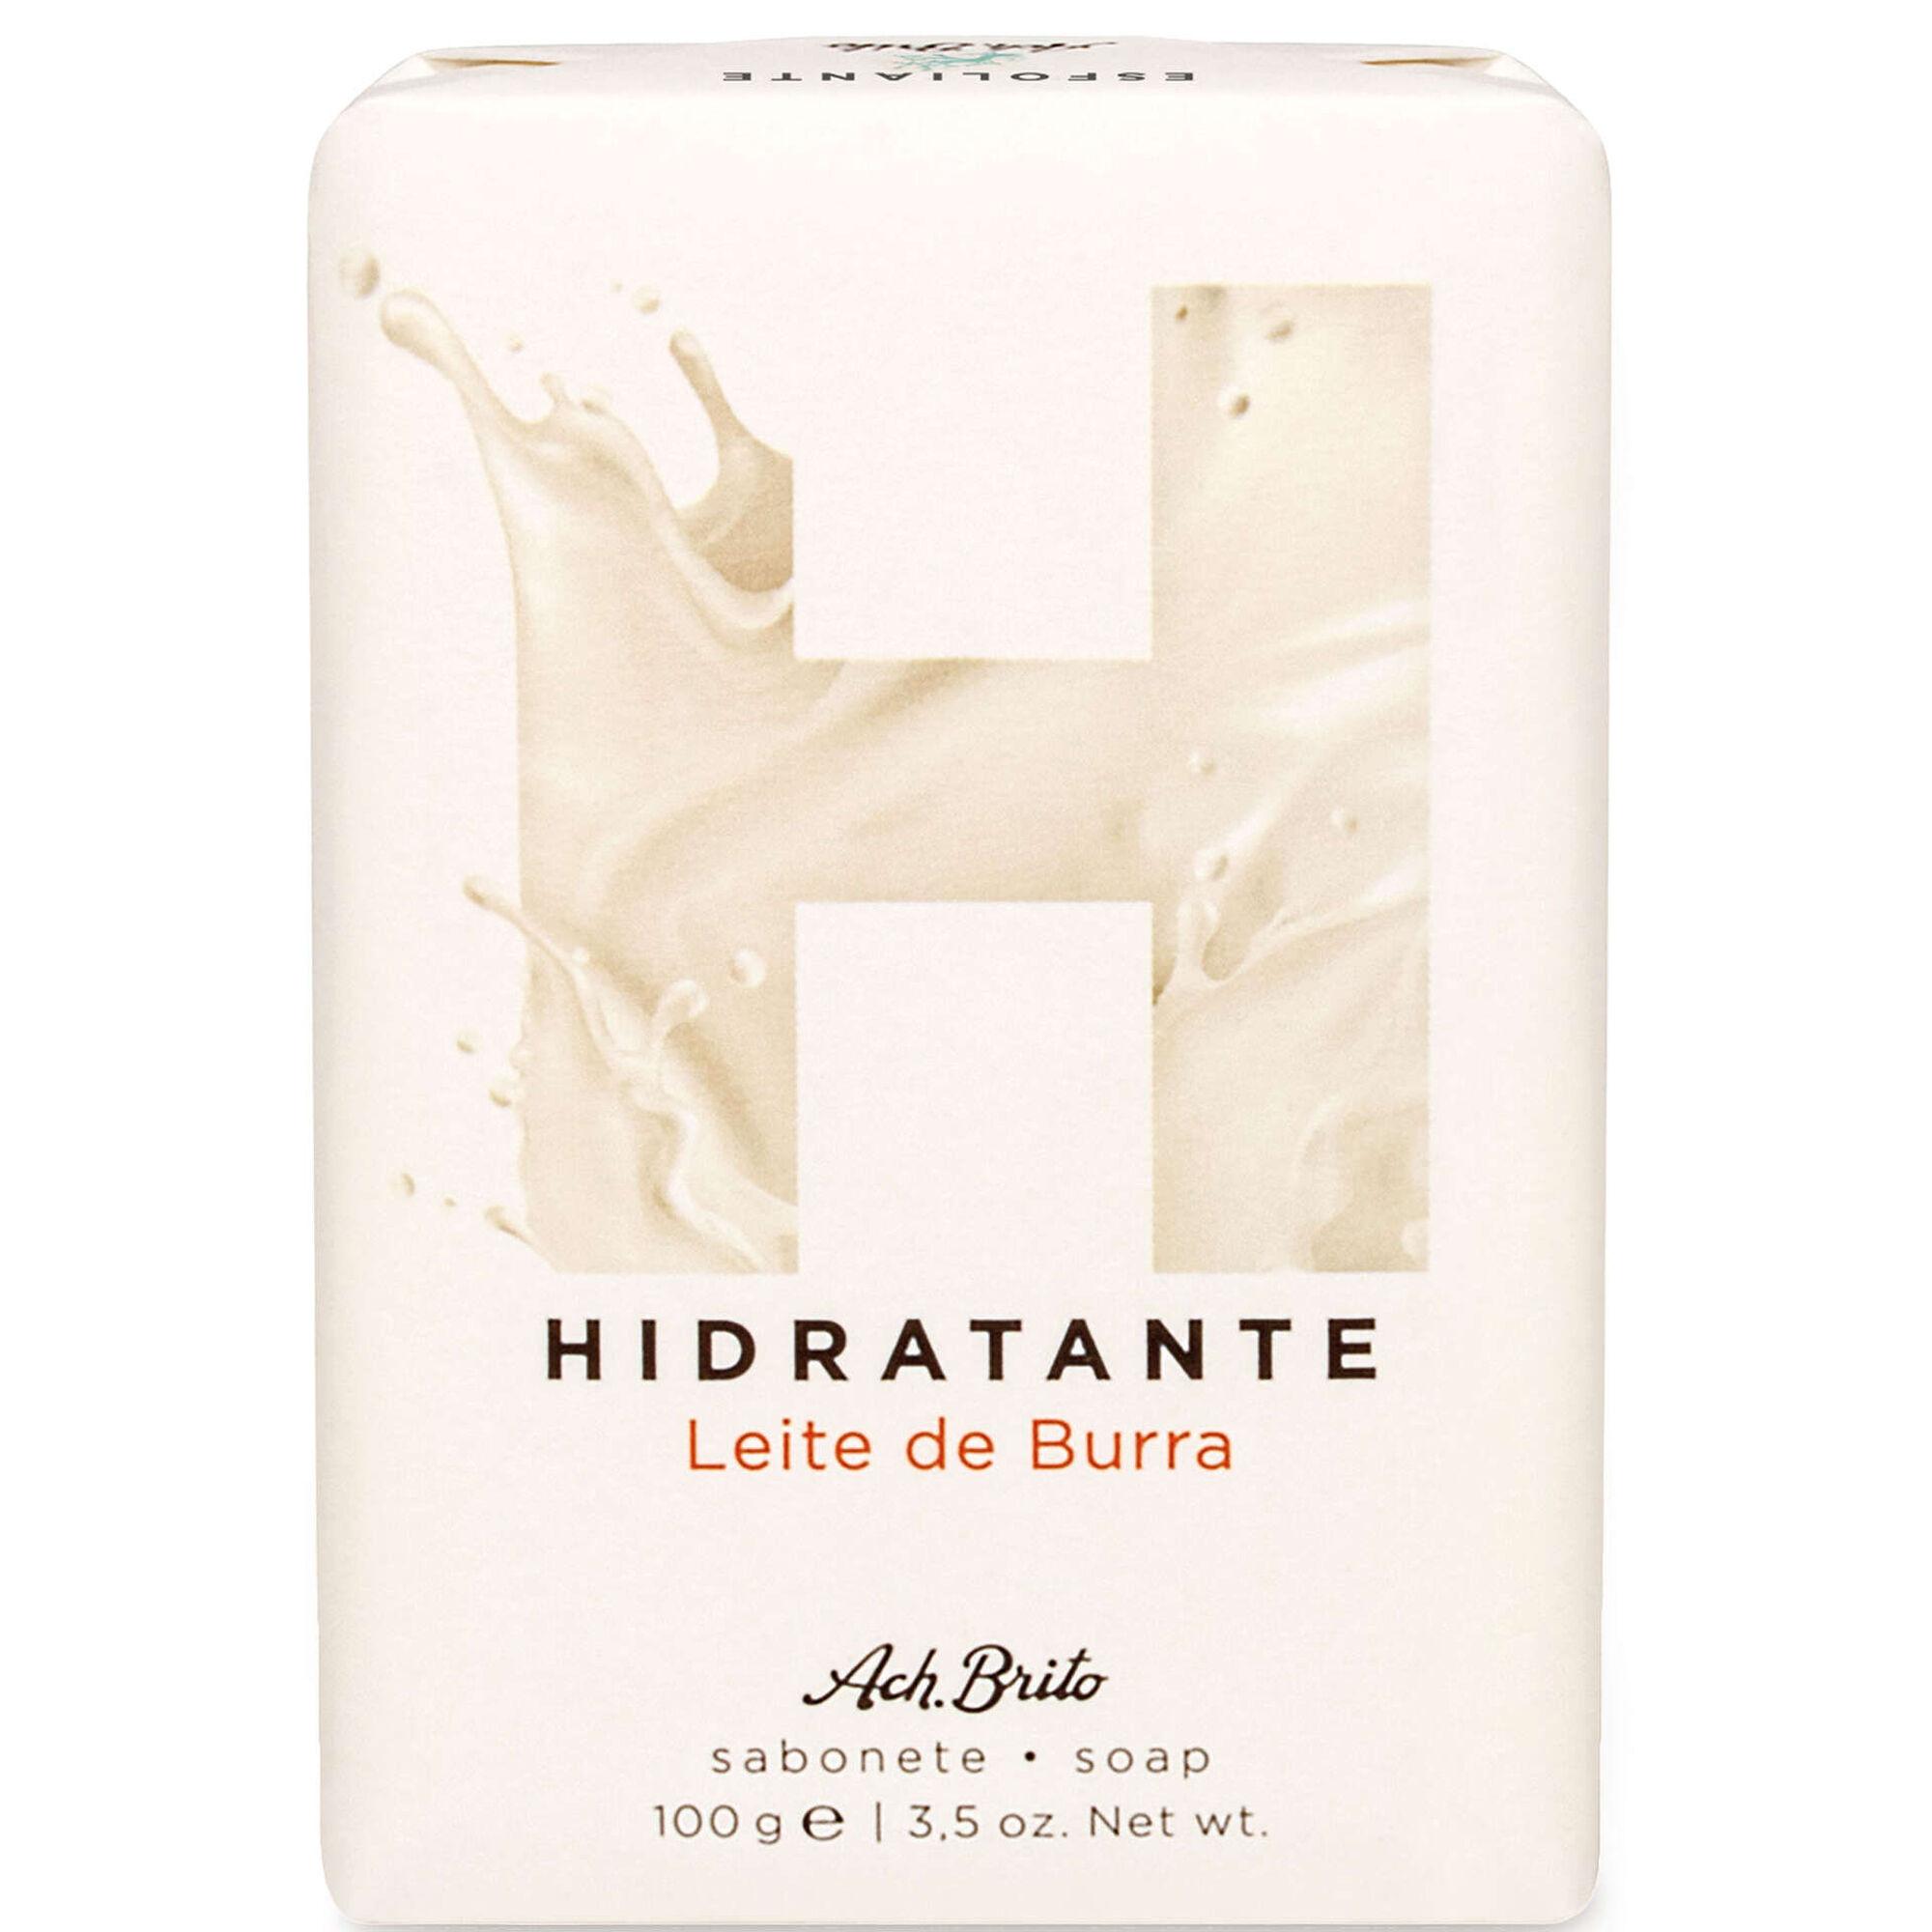 Sabonete Hidratante Leite de Burra